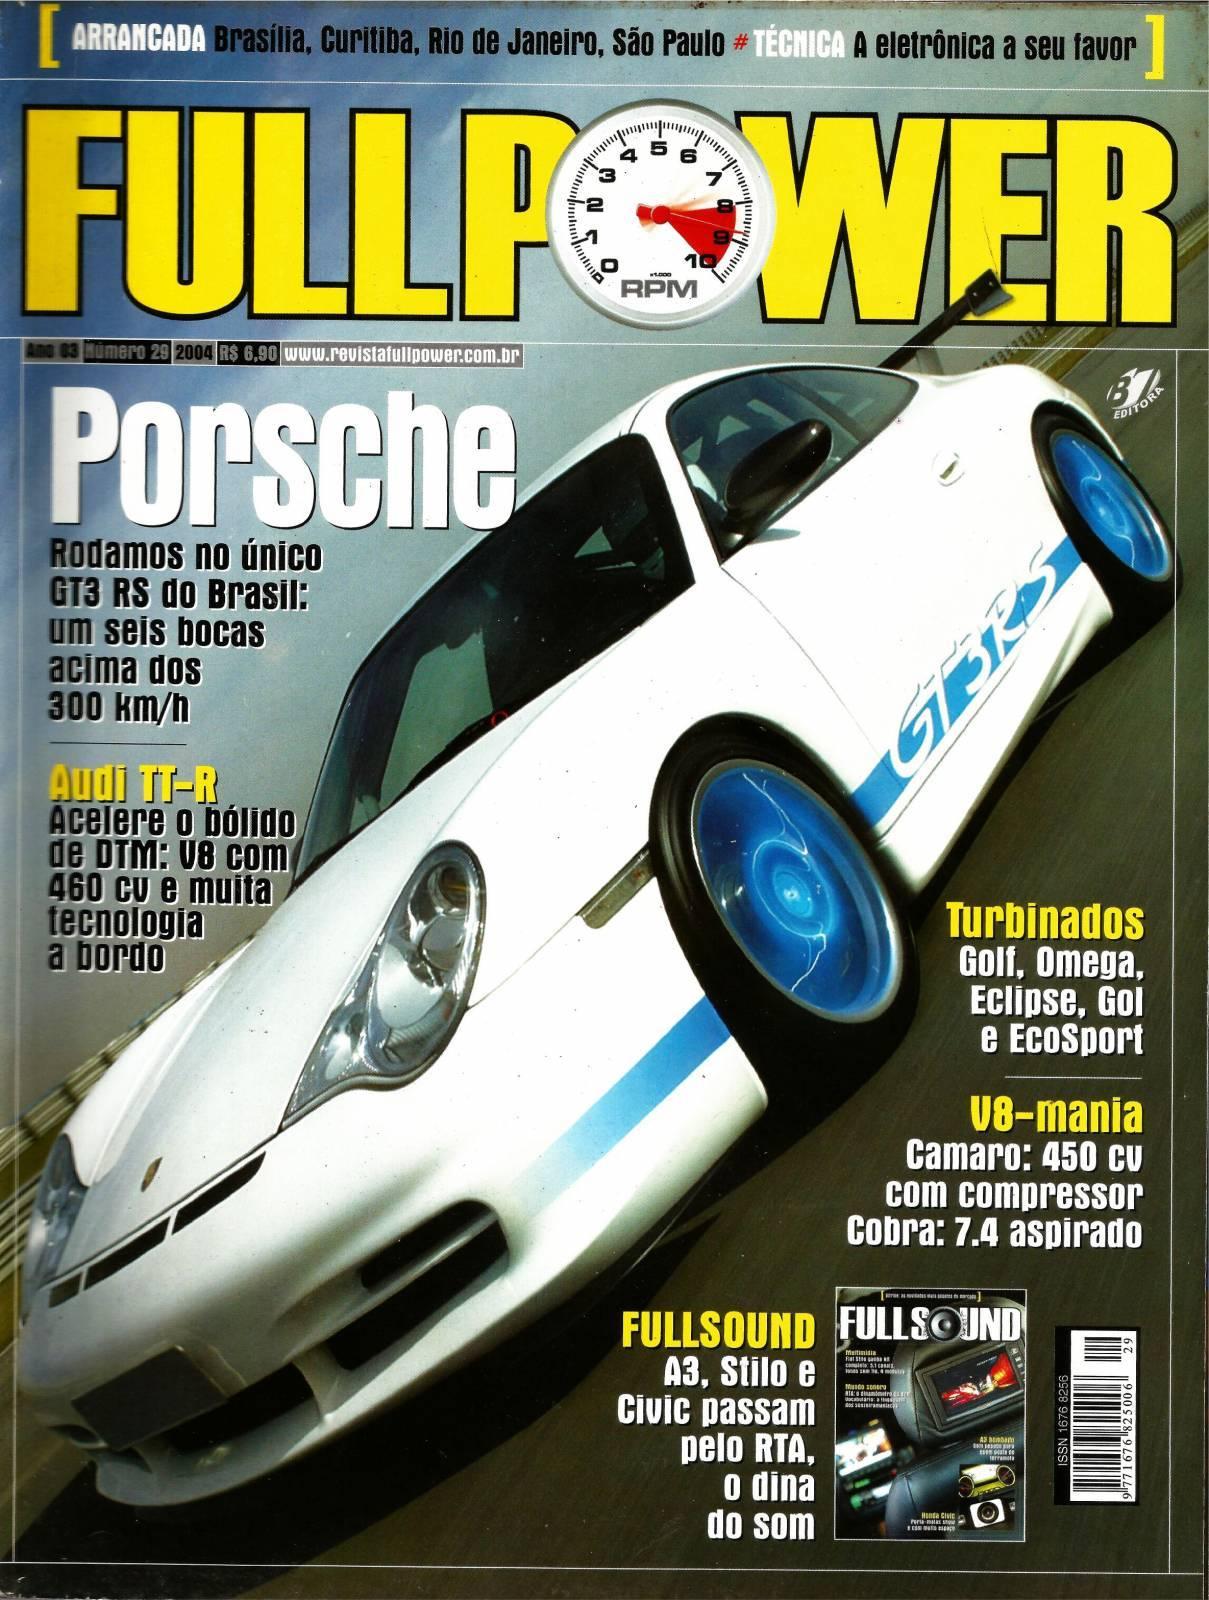 REVISTA FULLPOWER No. 29 ANO 2004 - Loja FullPower